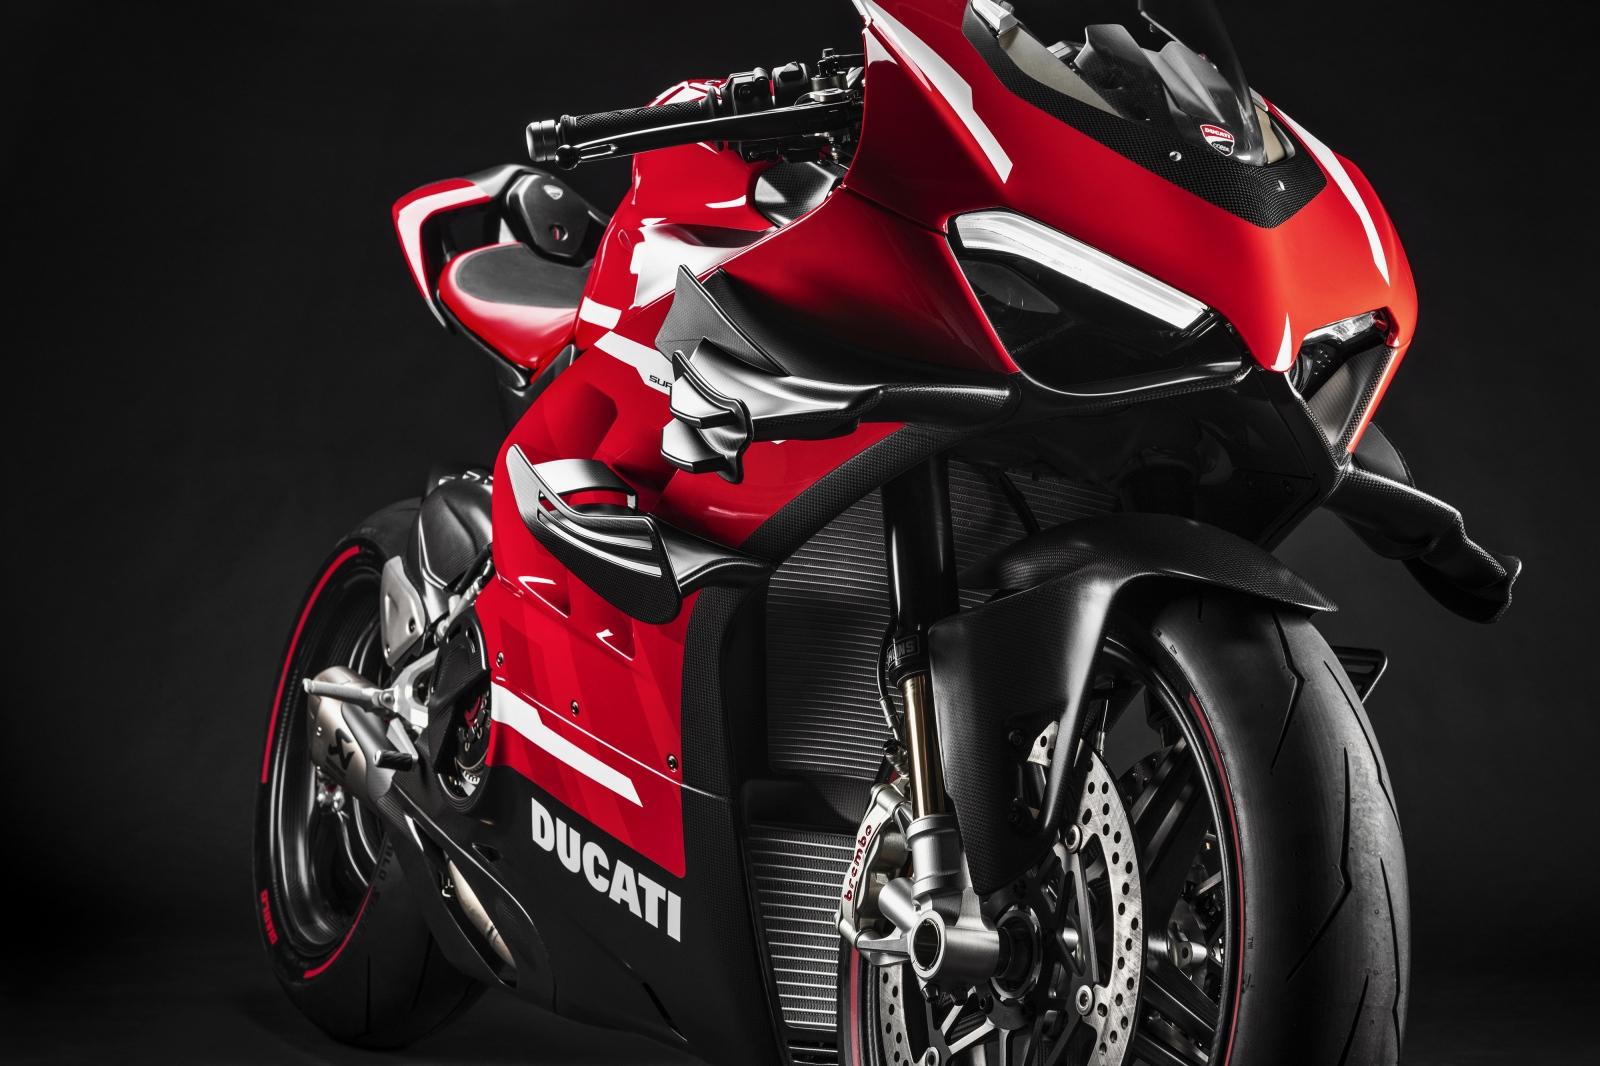 Ducati Superleggera V4 2020